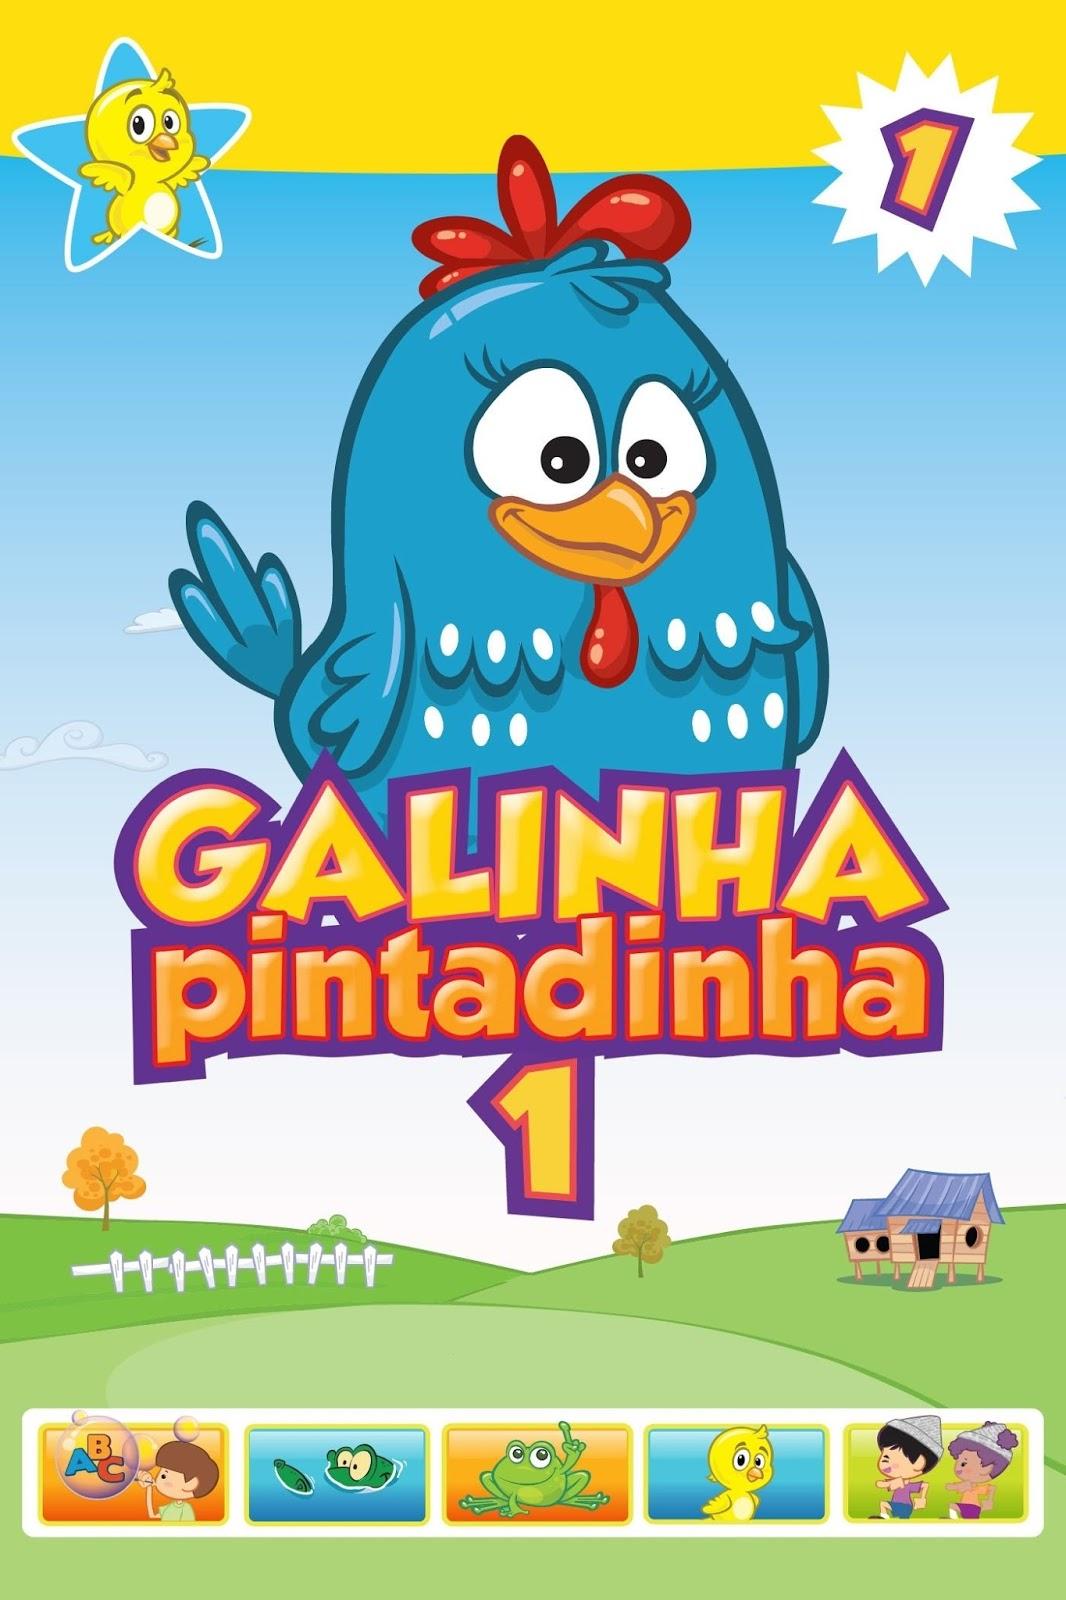 BAIXAR AVI PINTADINHA GALINHA GRATIS 3